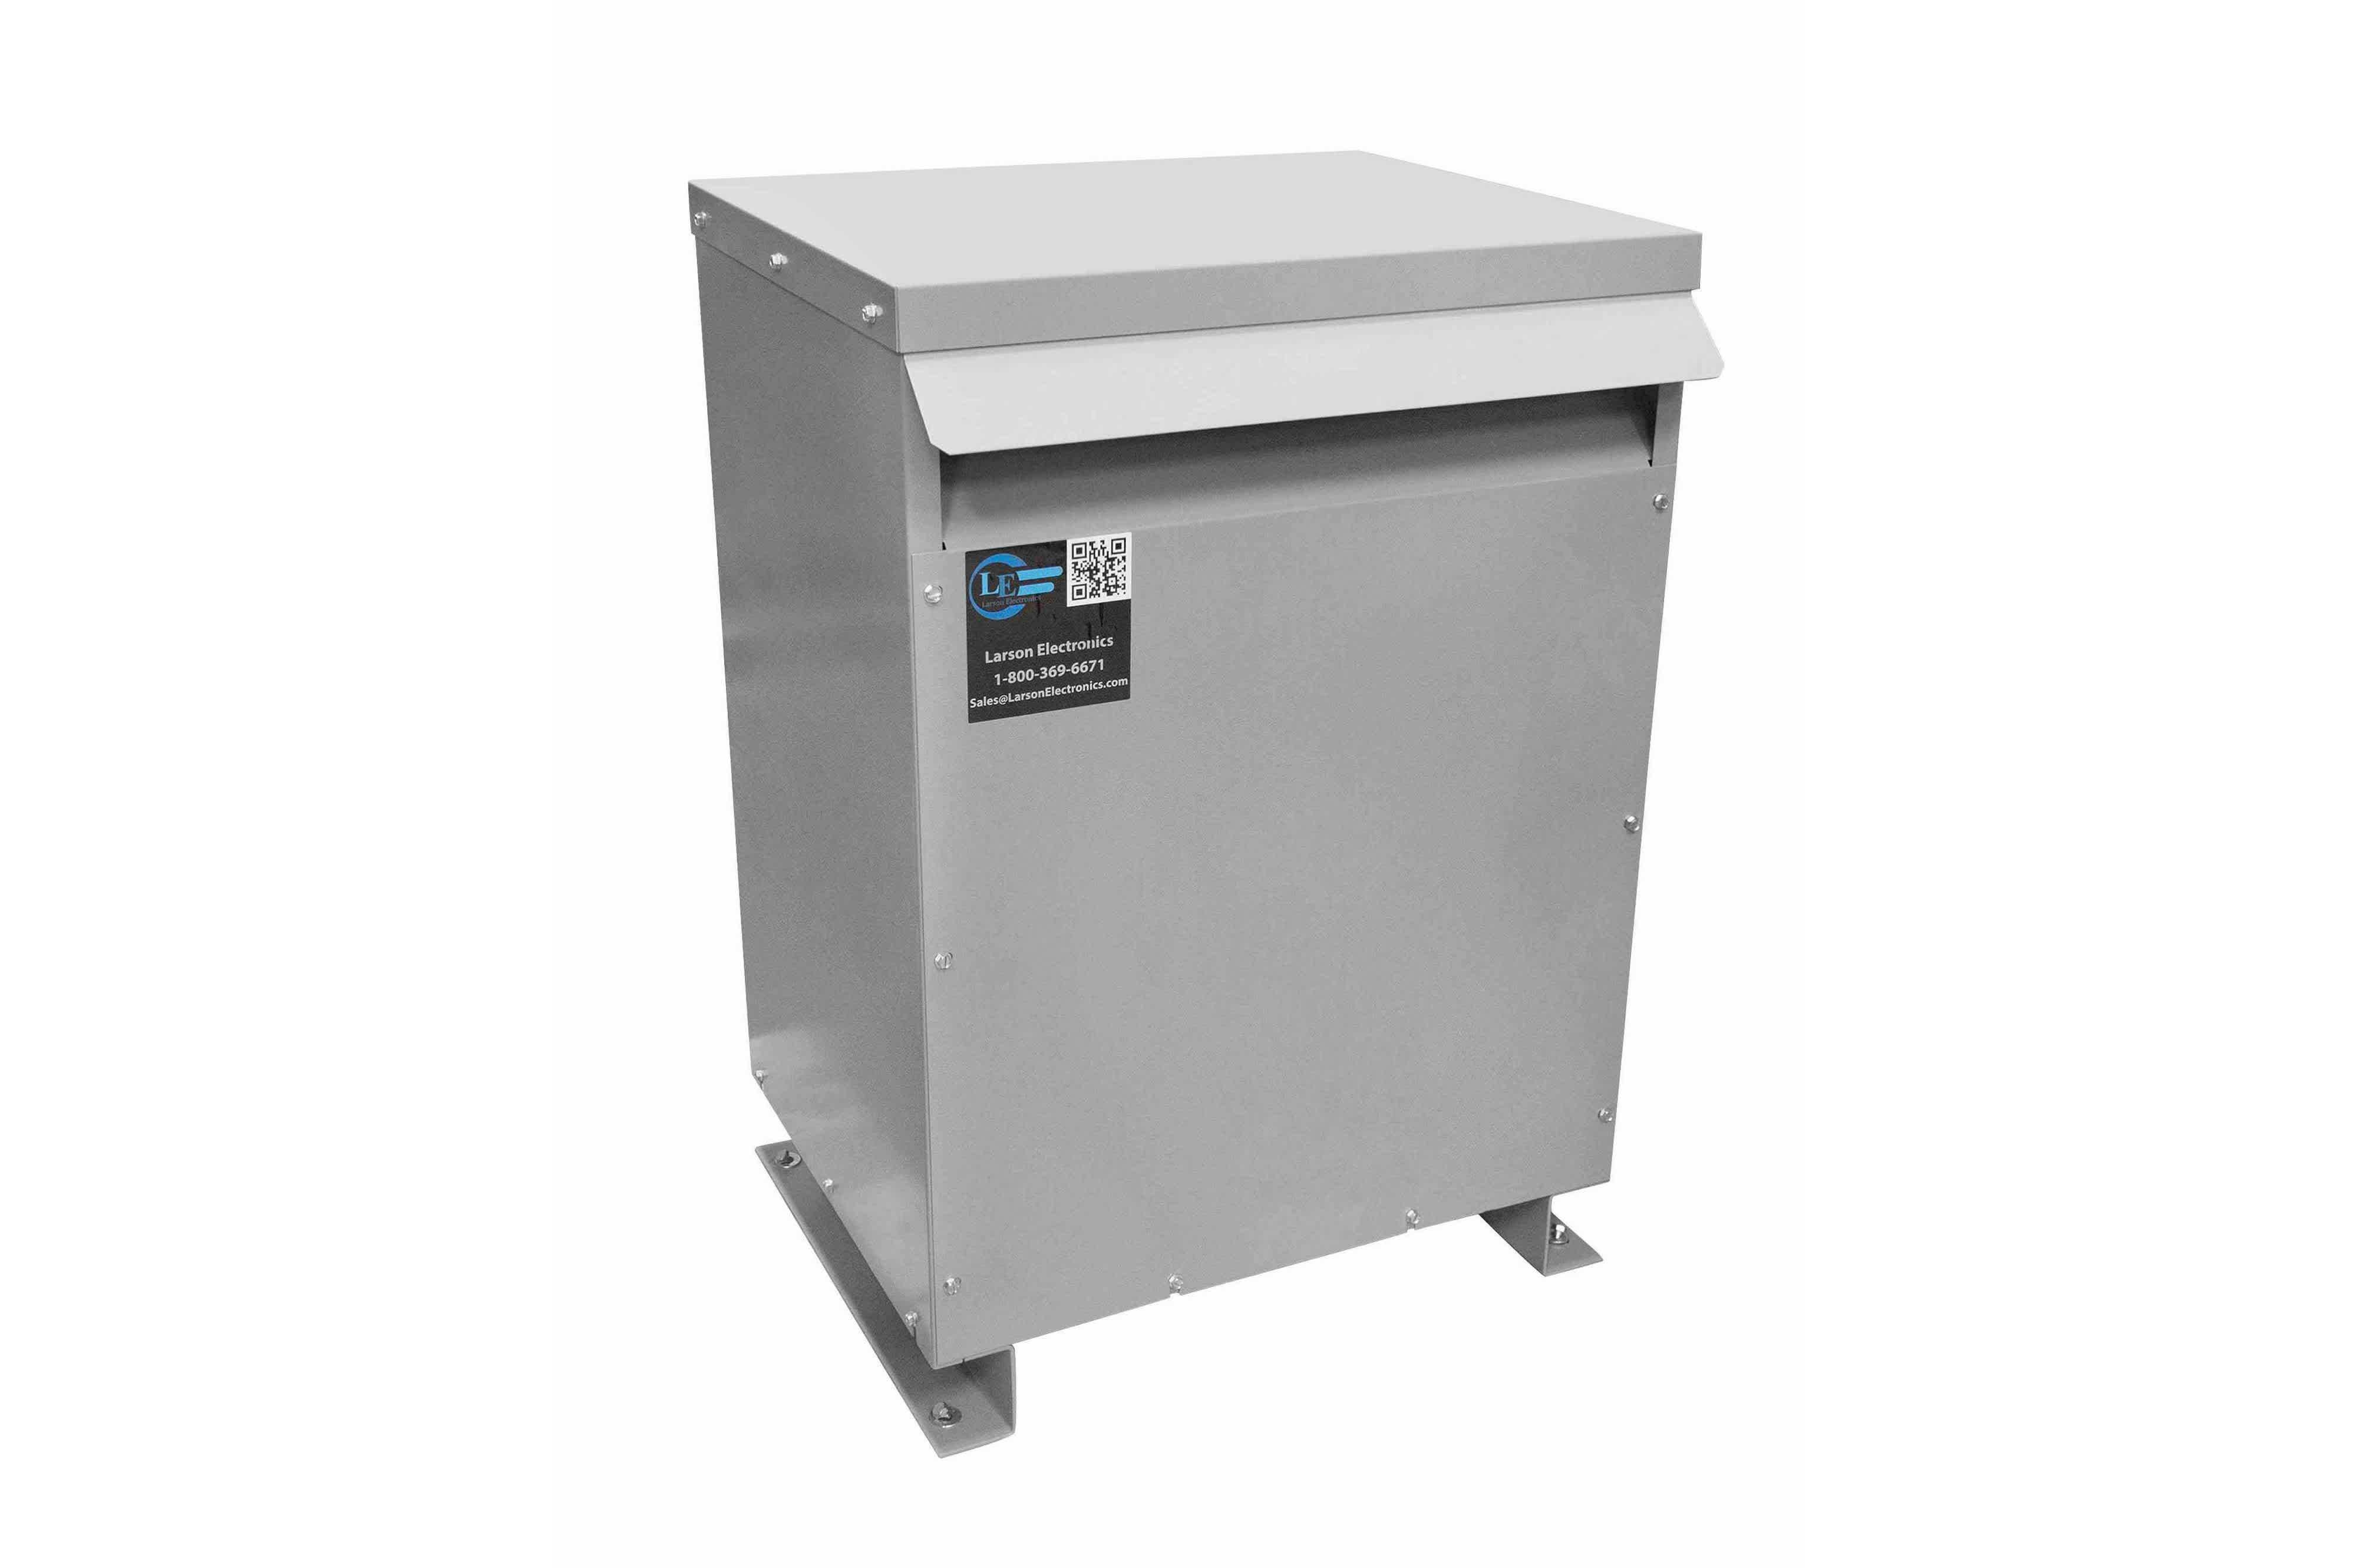 115 kVA 3PH Isolation Transformer, 220V Wye Primary, 208Y/120 Wye-N Secondary, N3R, Ventilated, 60 Hz